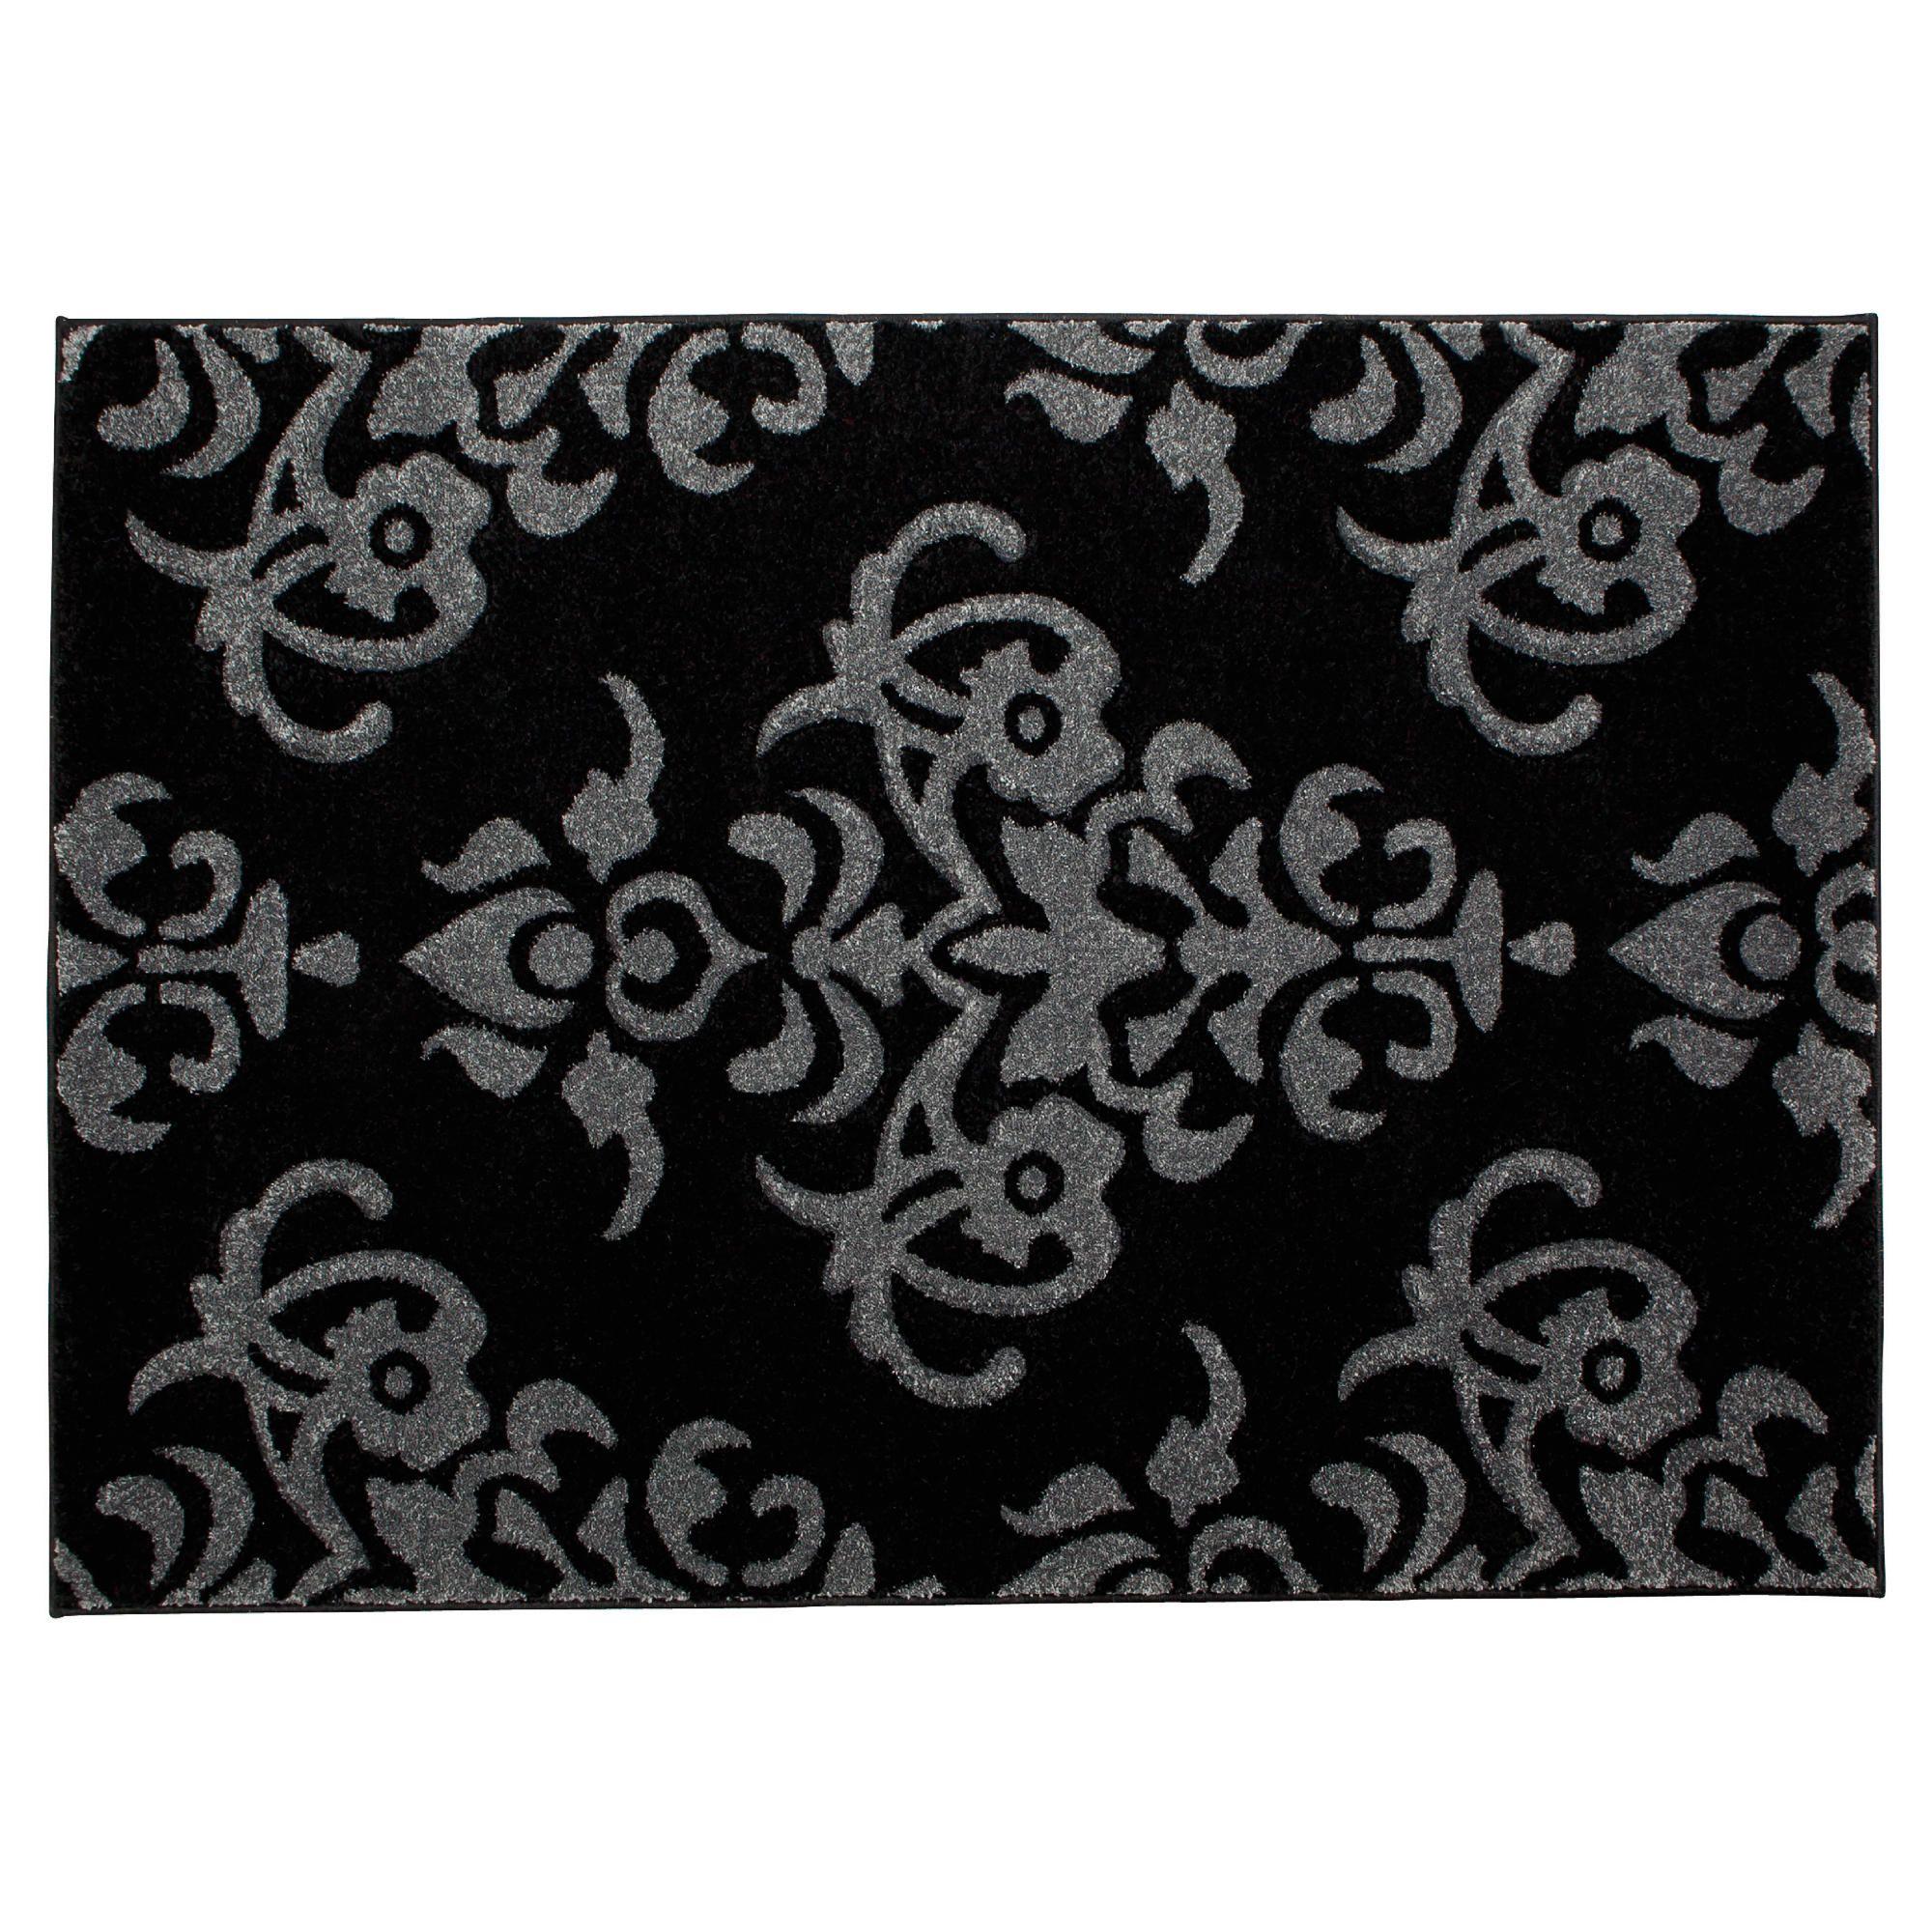 Black And Grey Rugs: Tesco Damask Rug 120x170cm Black/grey